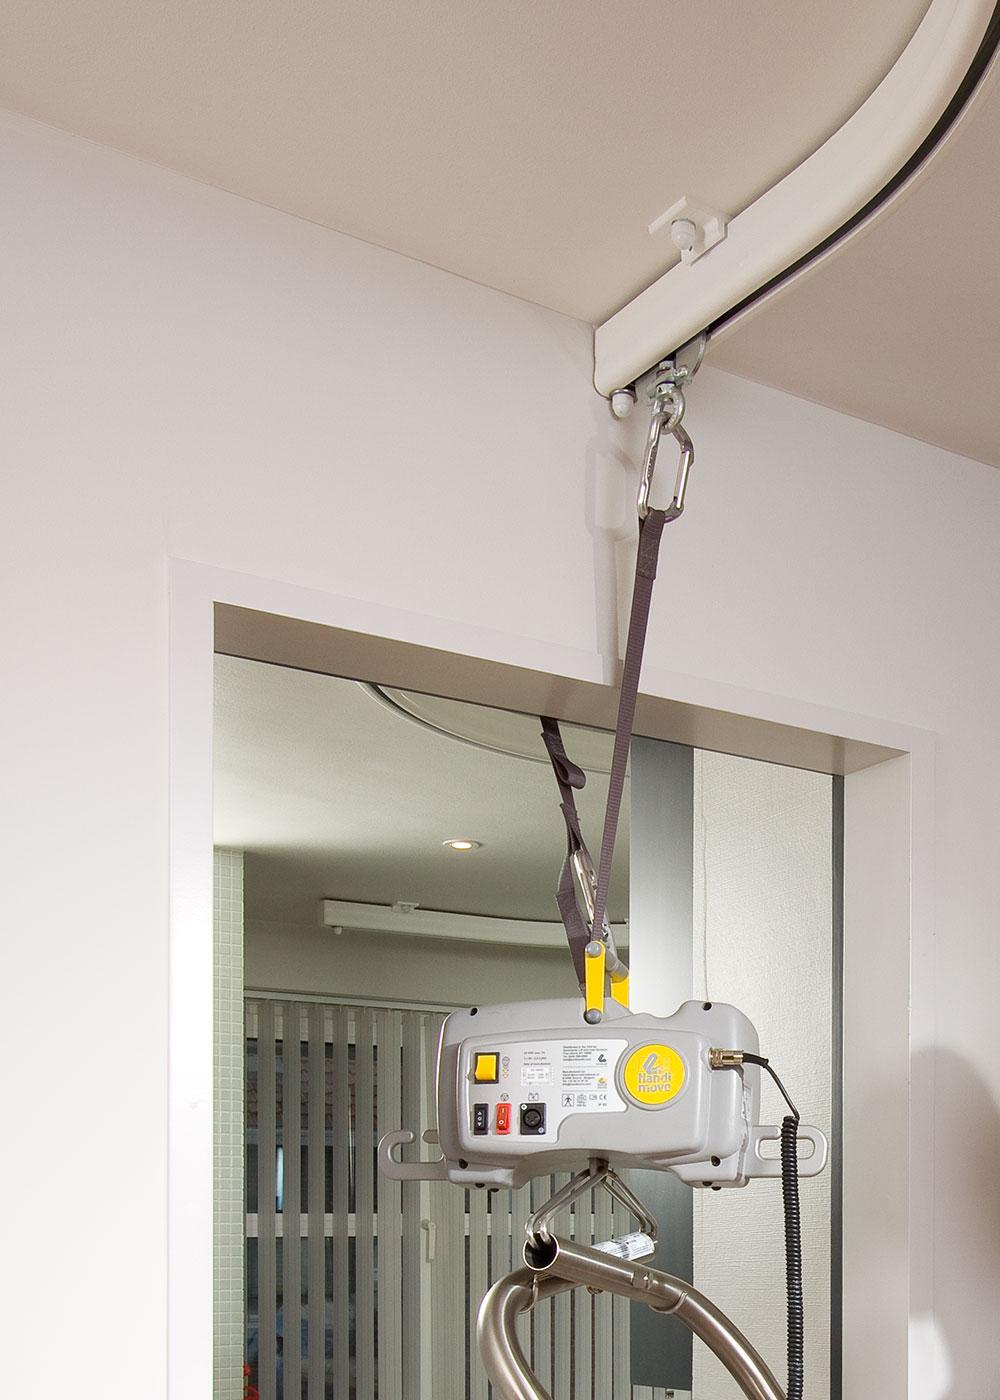 Draagbare tarzan plafondlift HM2545  Tiltechniek Waalwijk